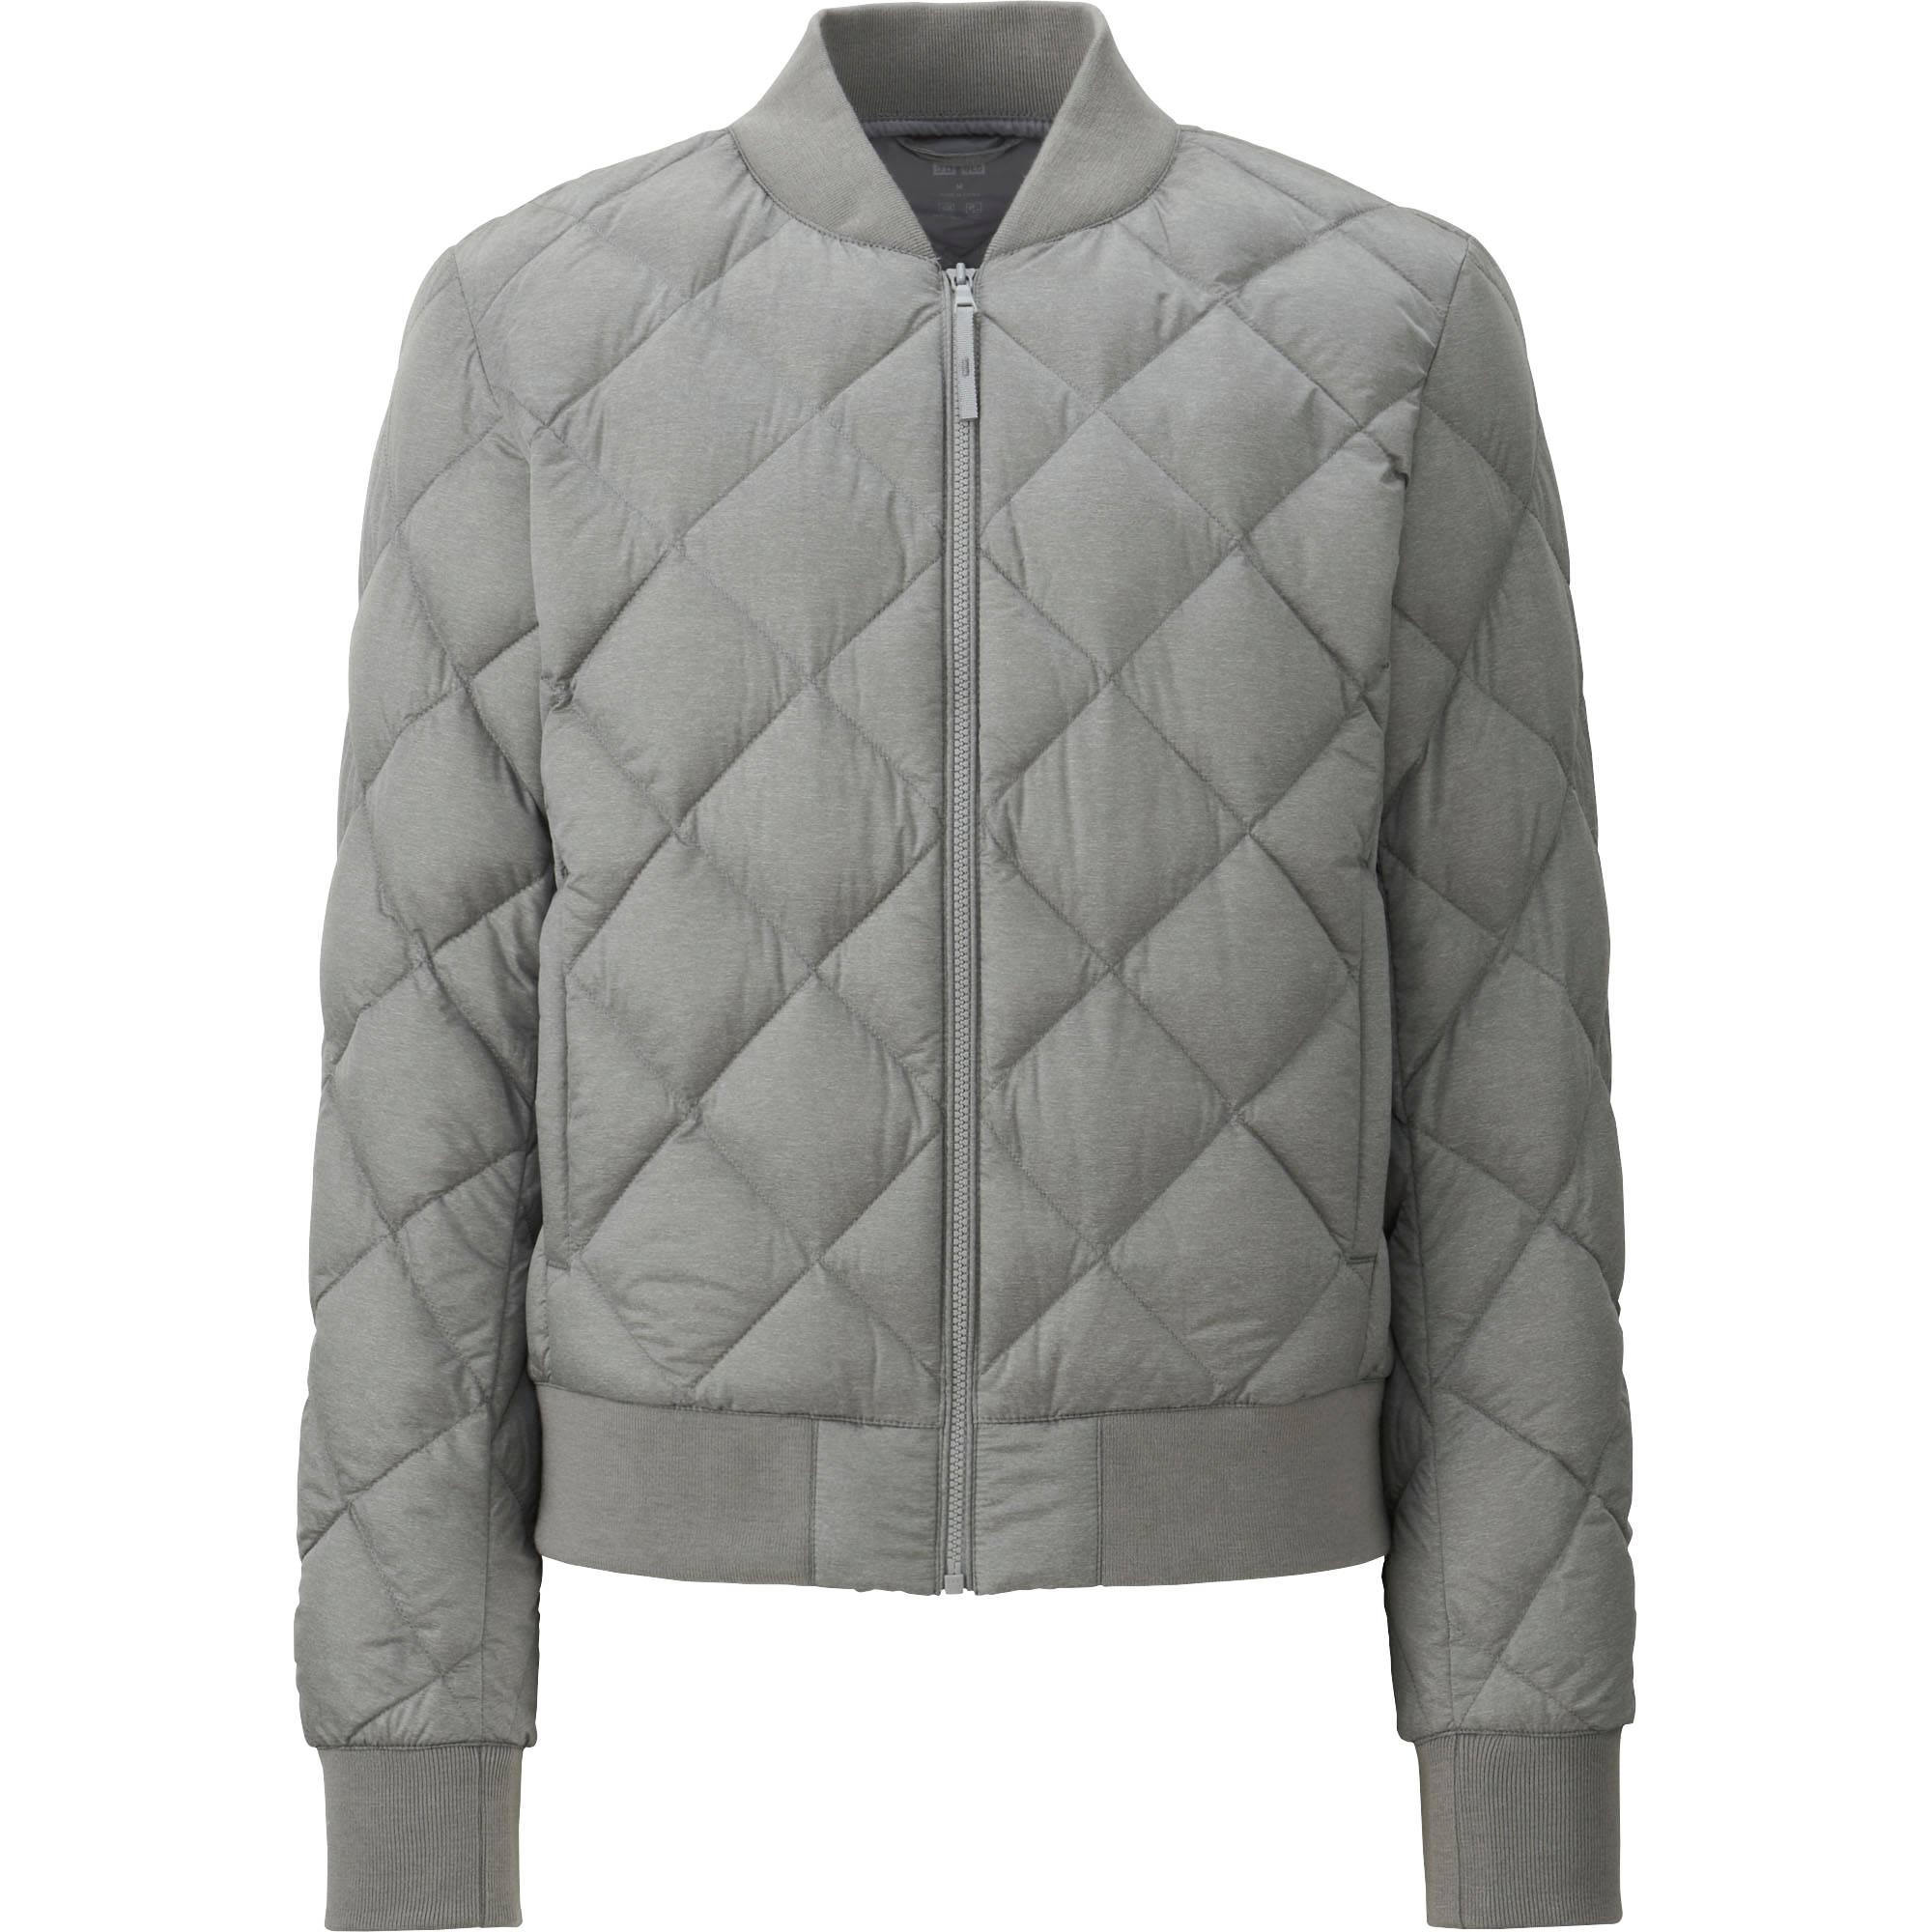 WOMEN ULTRA LIGHT DOWN RIBBED BLOUSON | UNIQLO US : uniqlo quilted jacket - Adamdwight.com